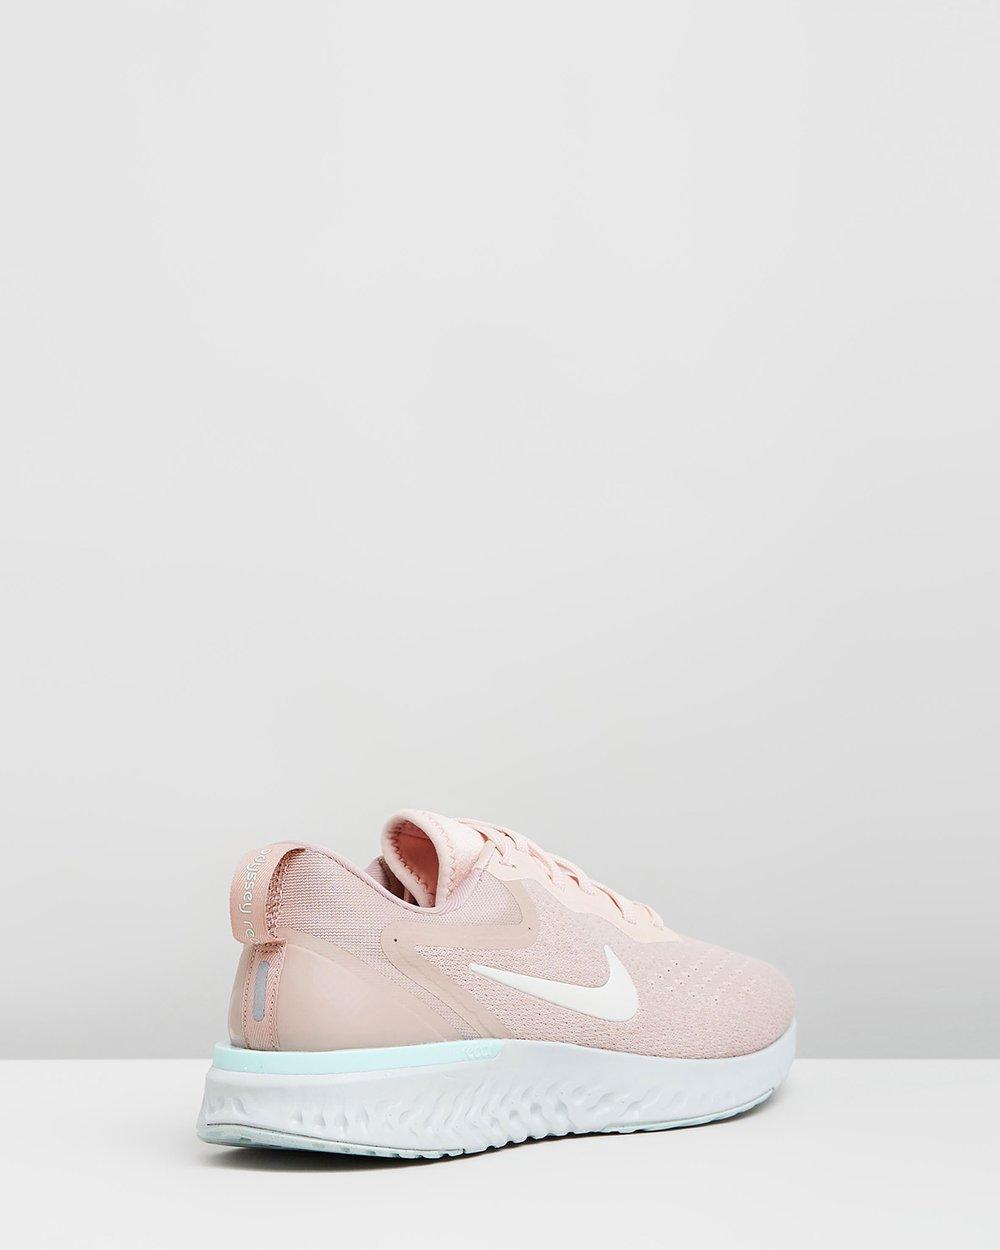 Odyssey React - Women s by Nike Online  e2a51702c69